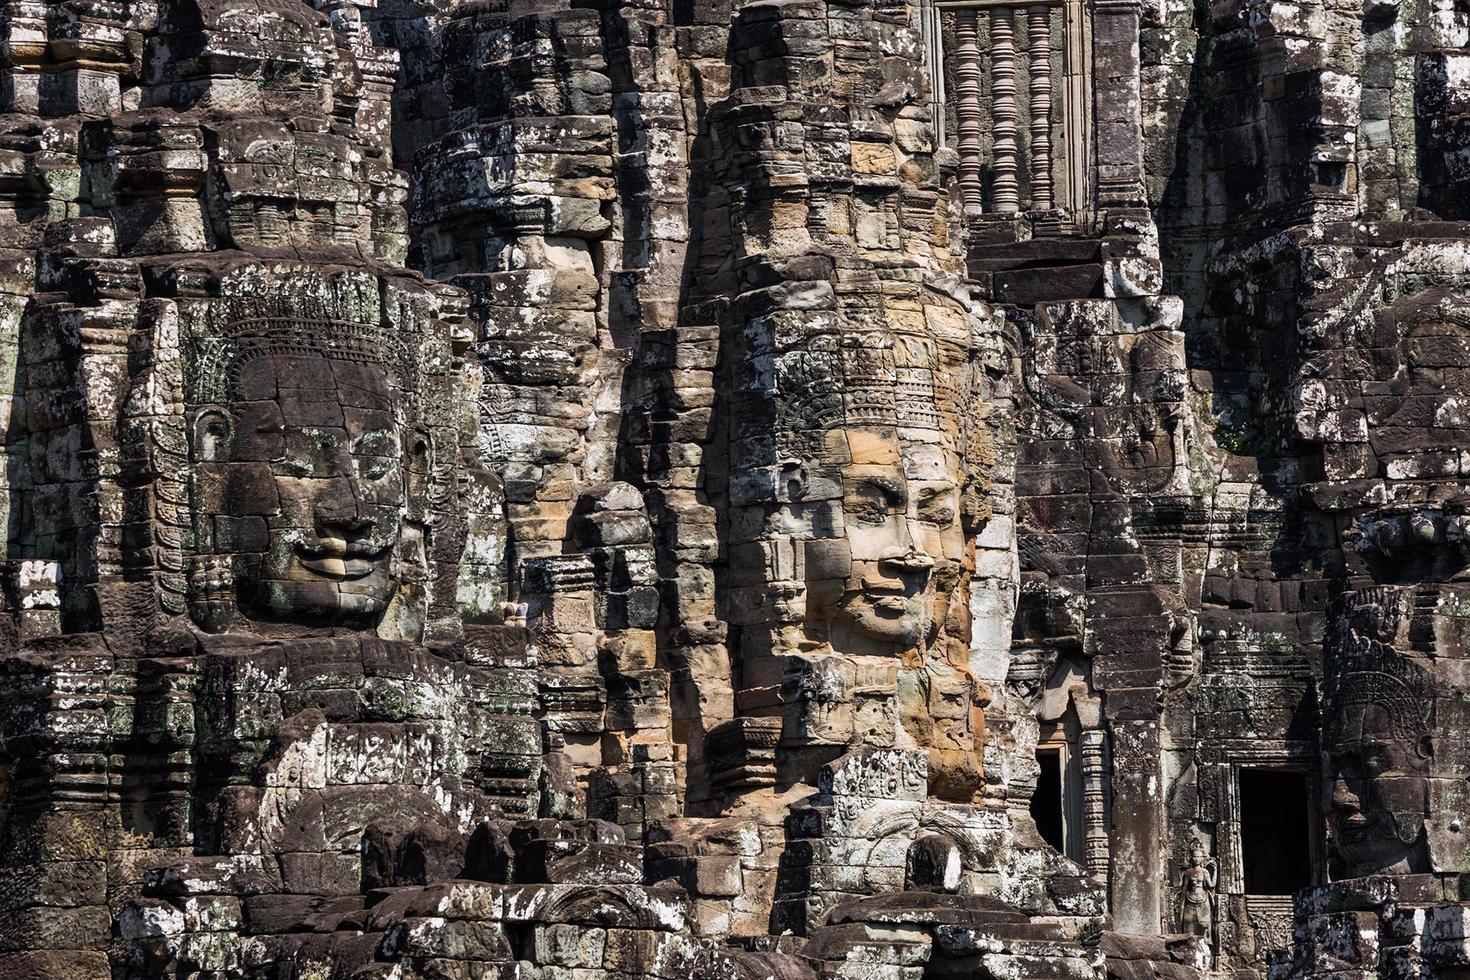 prasat bayon in siem reap provincie cambodja. foto